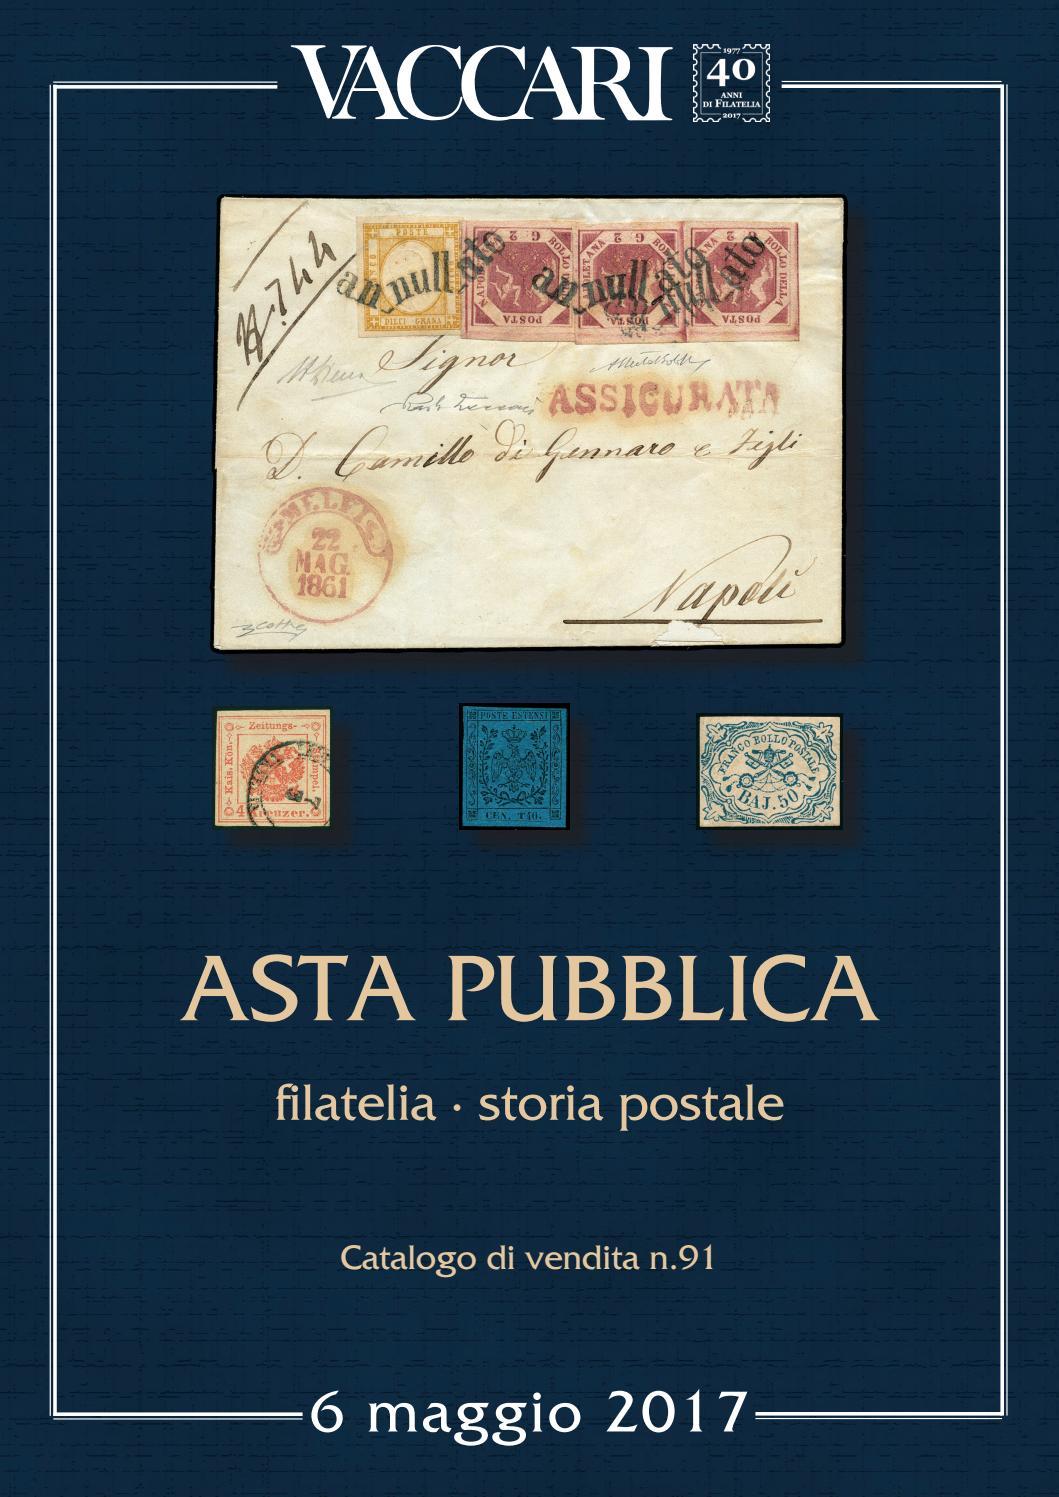 Special Section Austria 250 Diversi Francobolli Stamps Austria